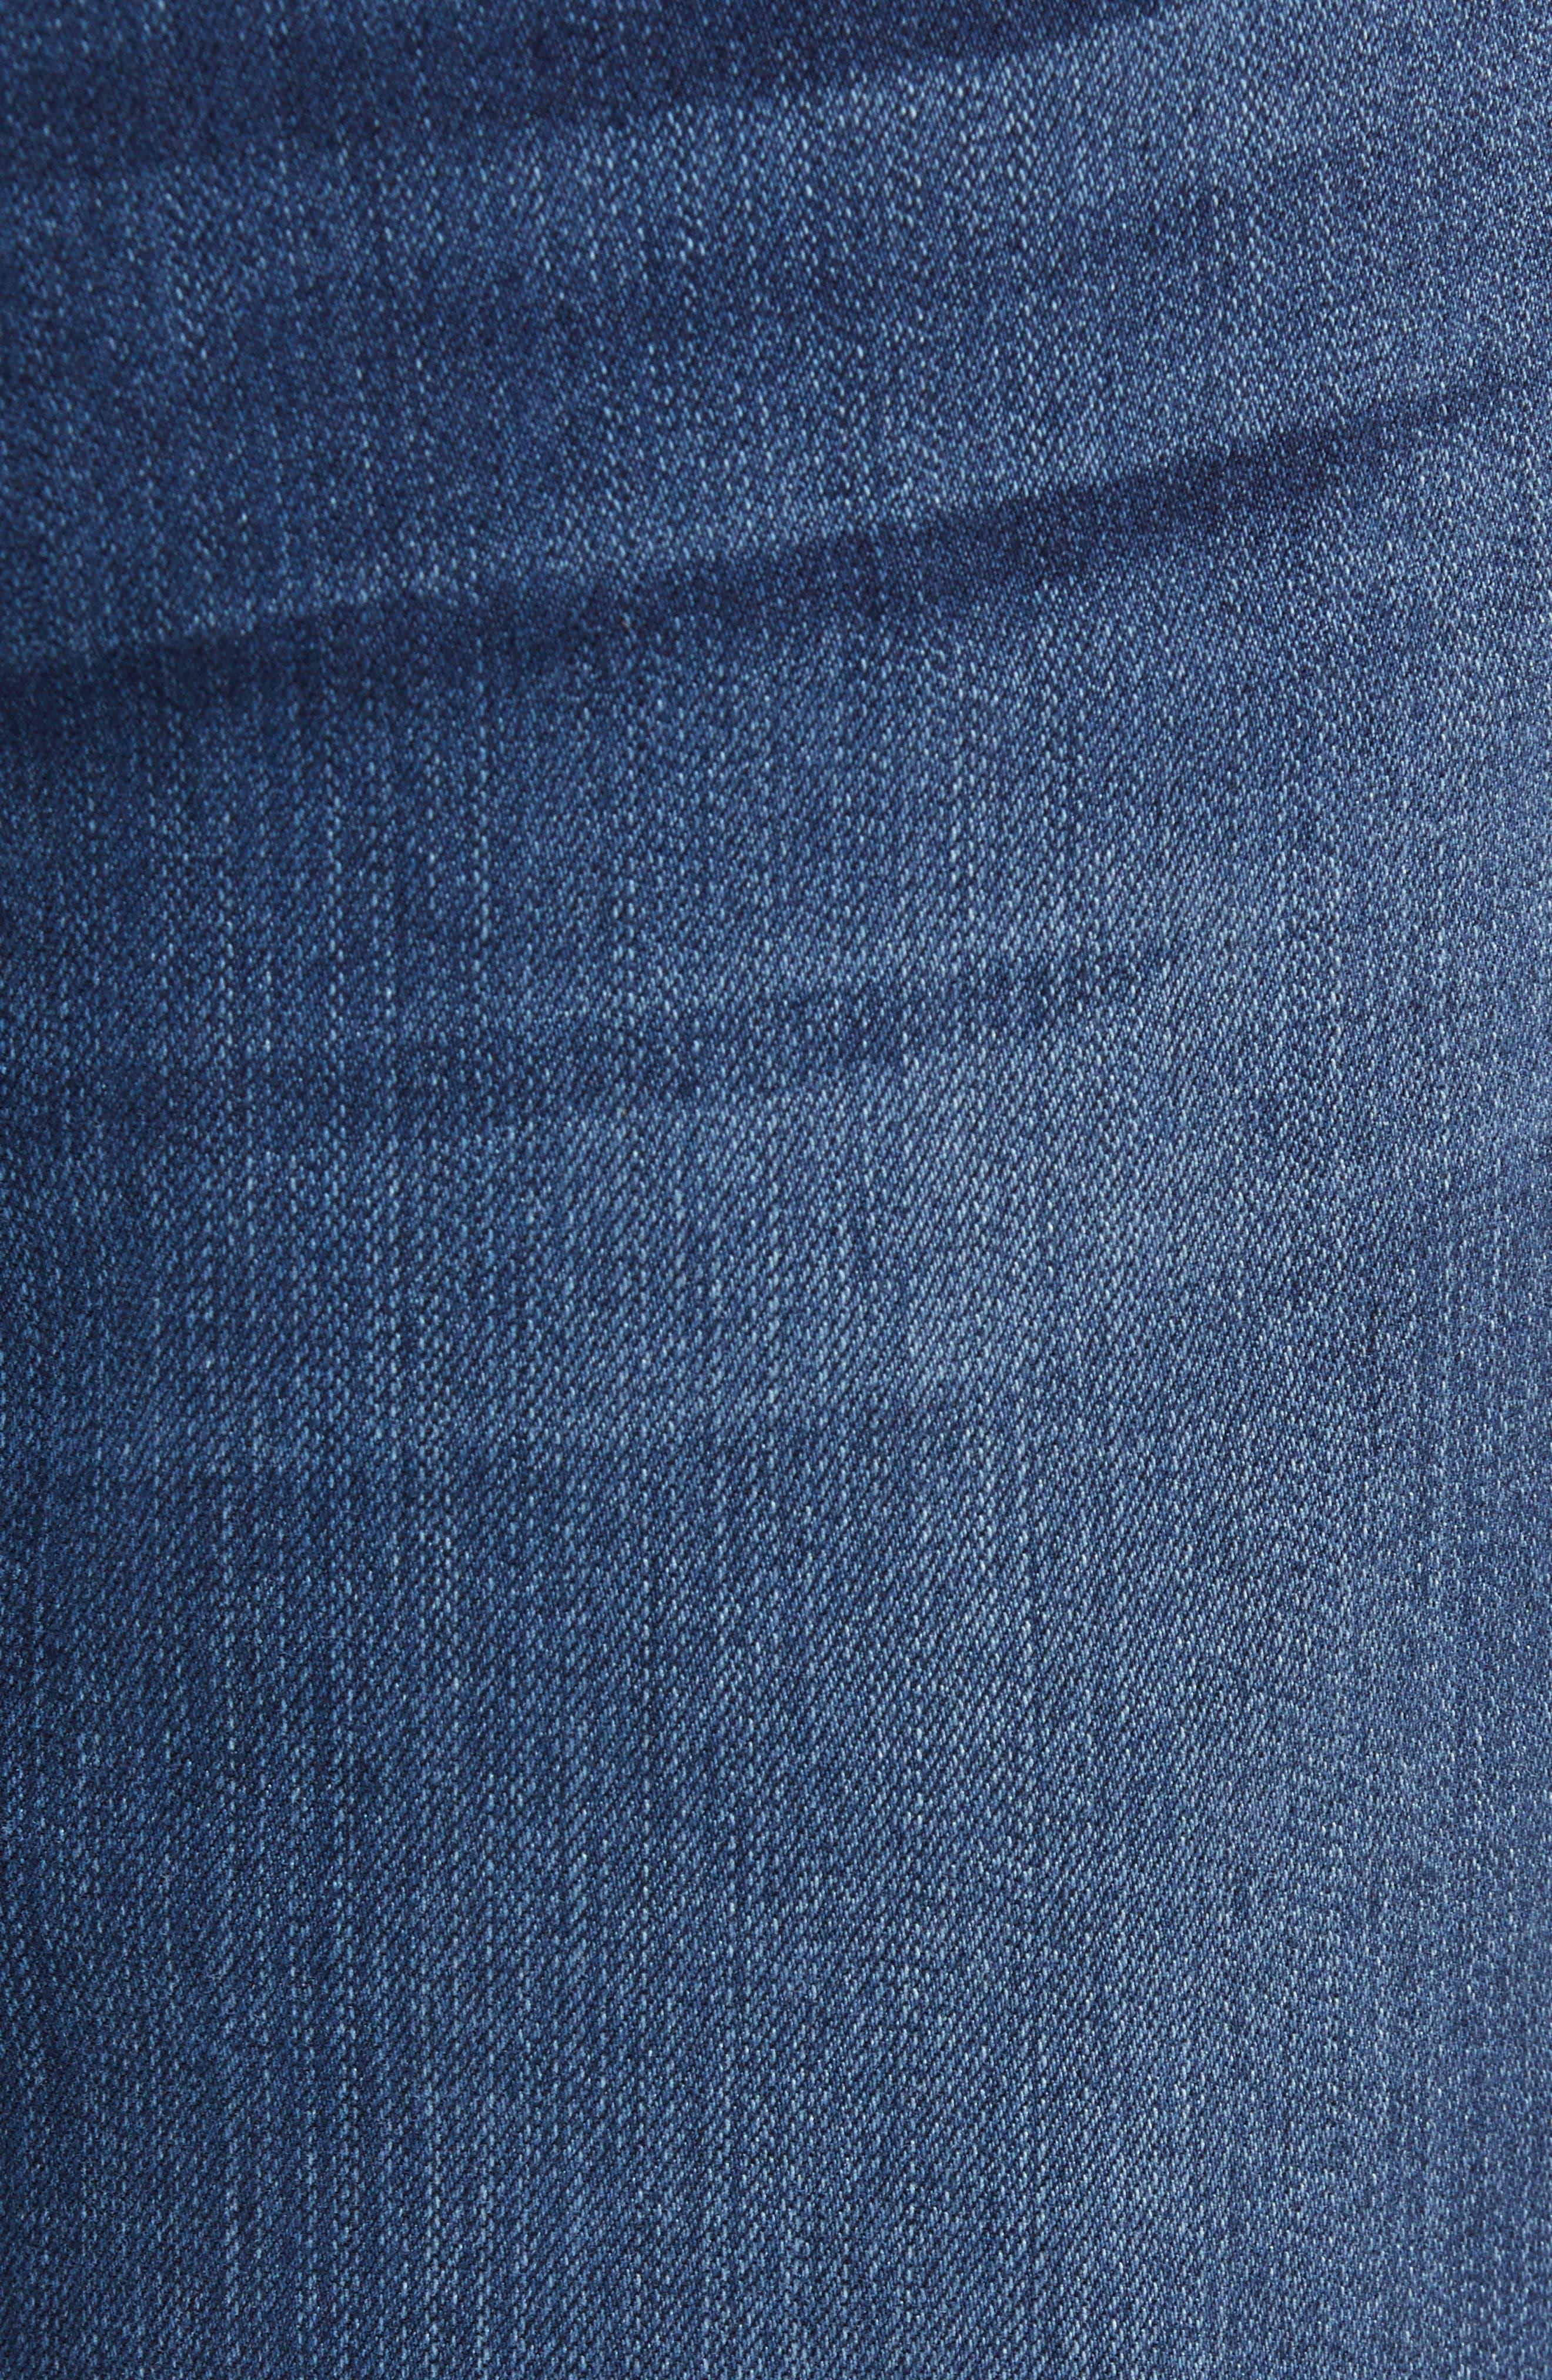 Byron Slim Straight Leg Jeans,                             Alternate thumbnail 5, color,                             403